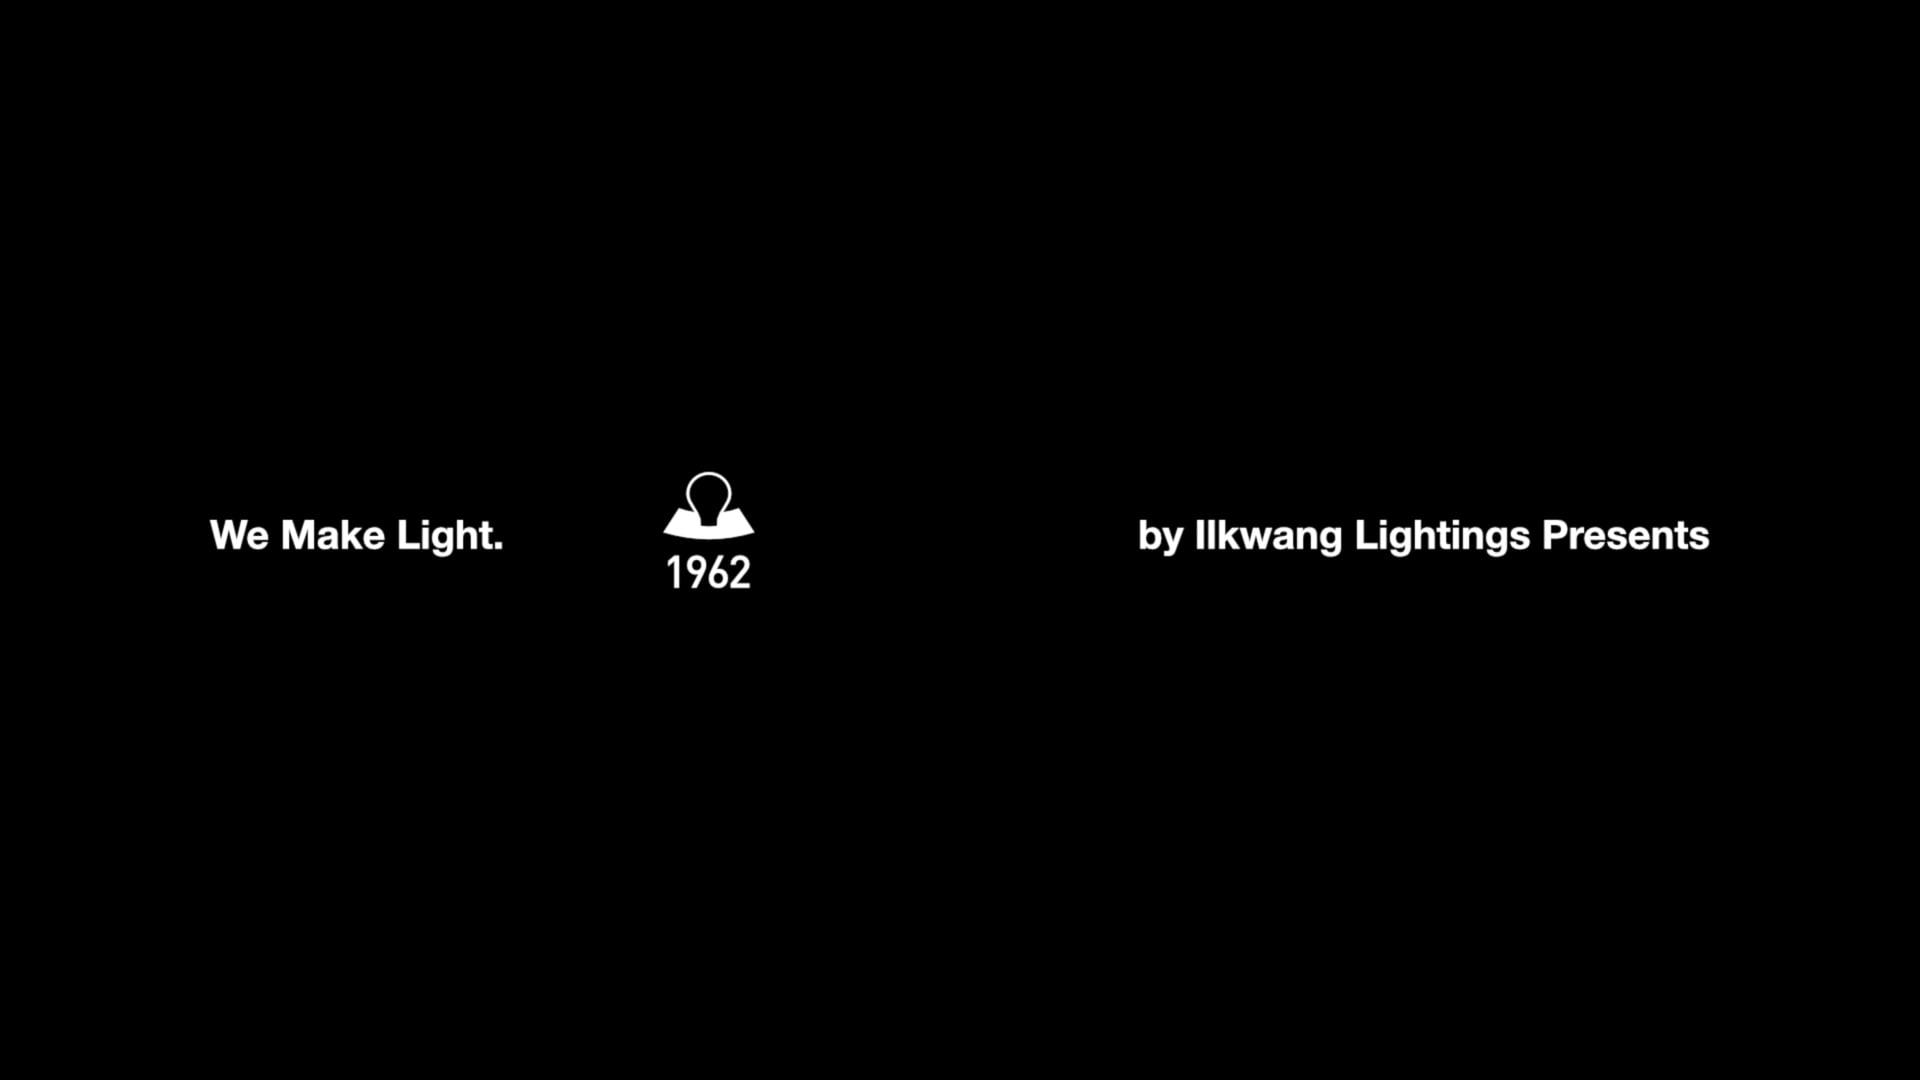 Ilkwang Lightings - We Make Light